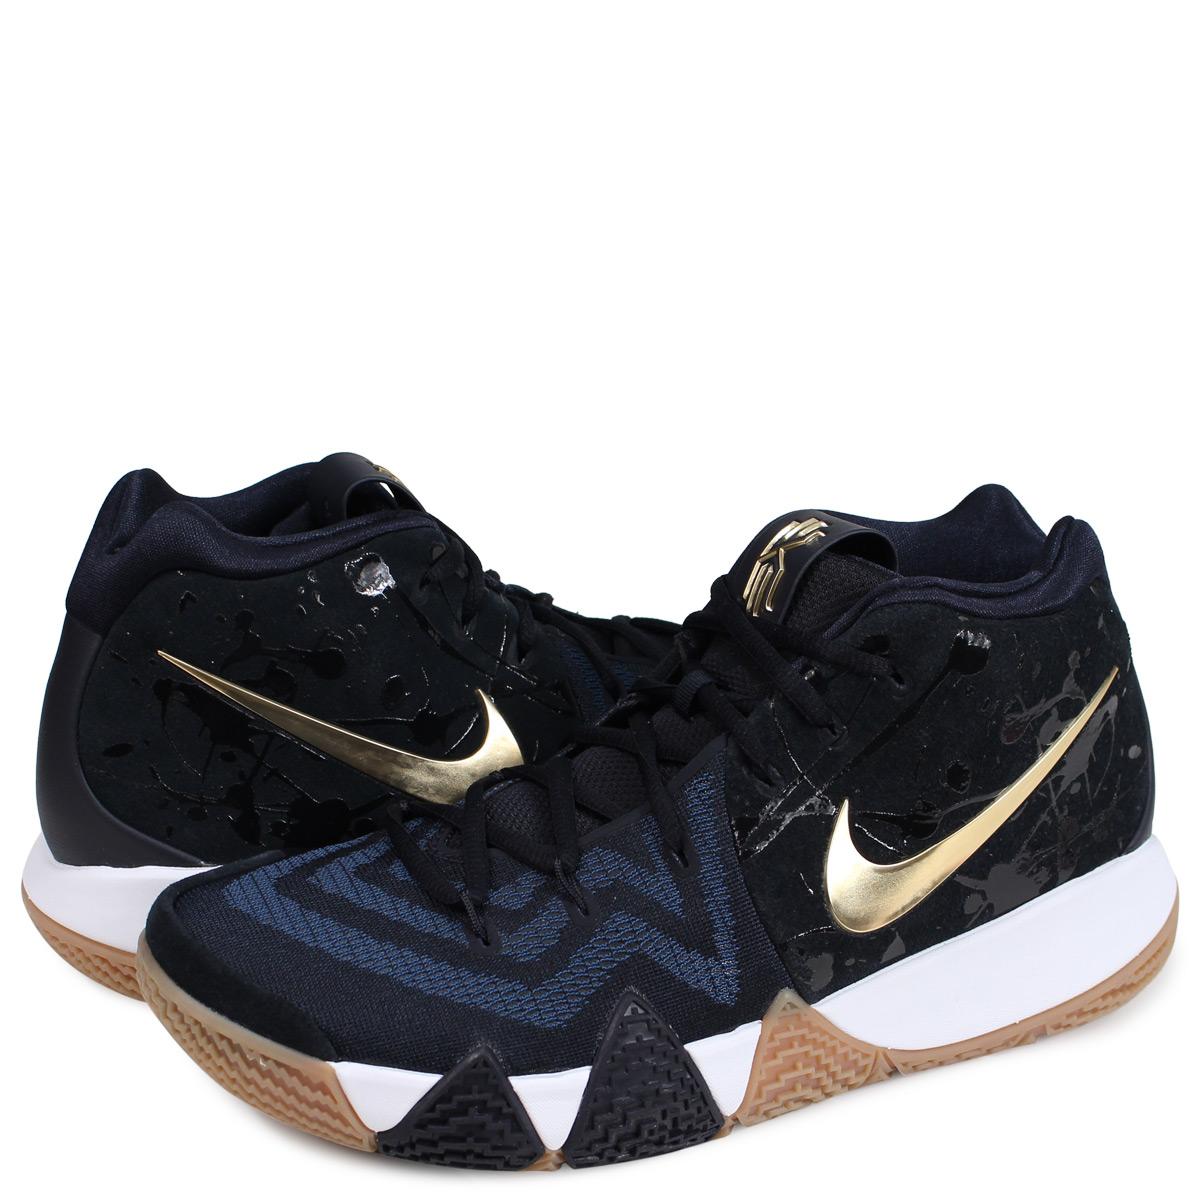 ALLSPORTS  Nike NIKE chi Lee 4 sneakers men KYRIE 4 EP blue 943 c55ef5b34